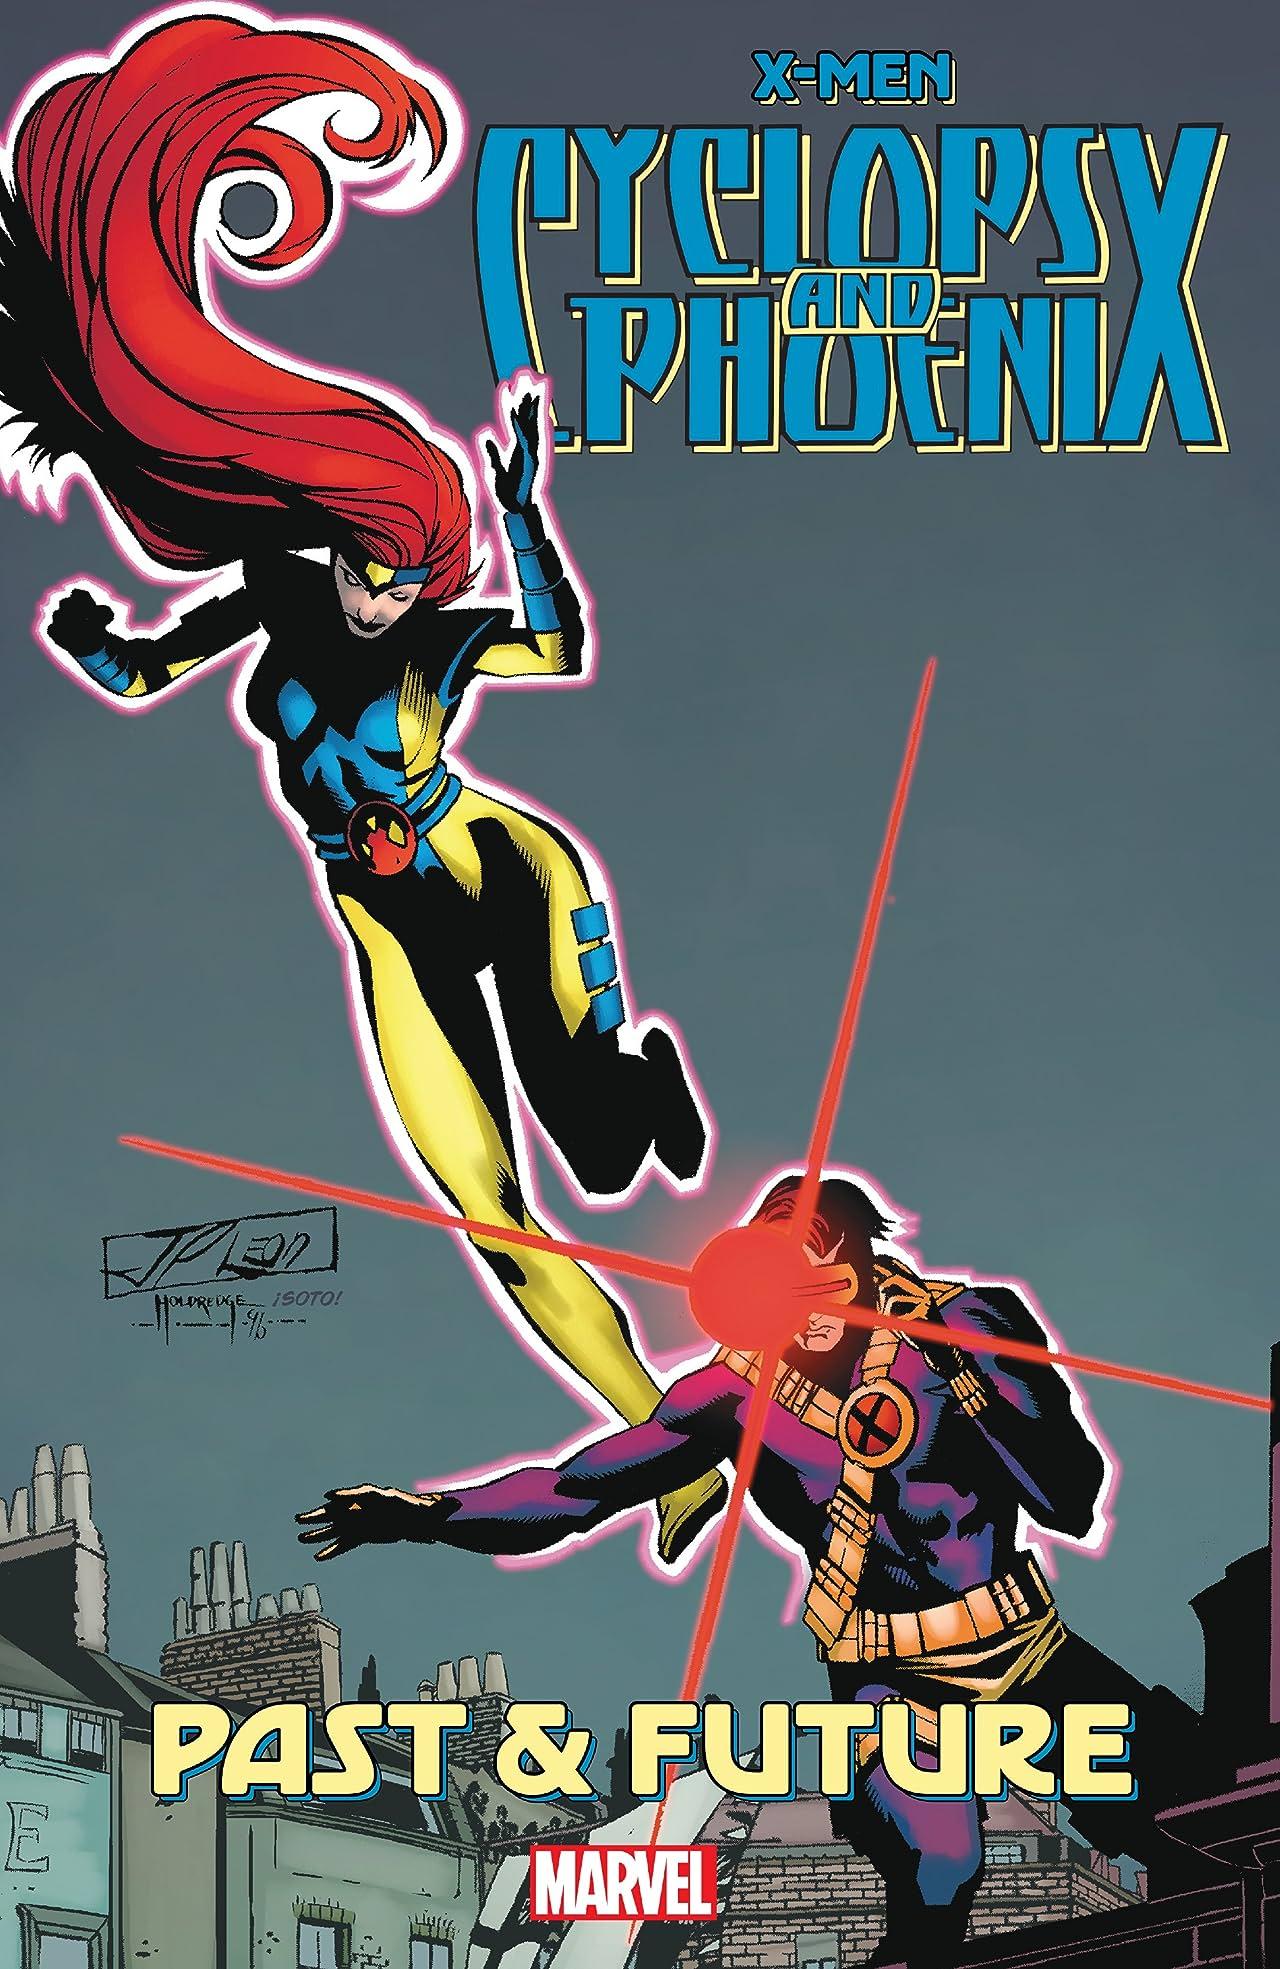 X-Men: Cyclops & Phoenix - Past & Future